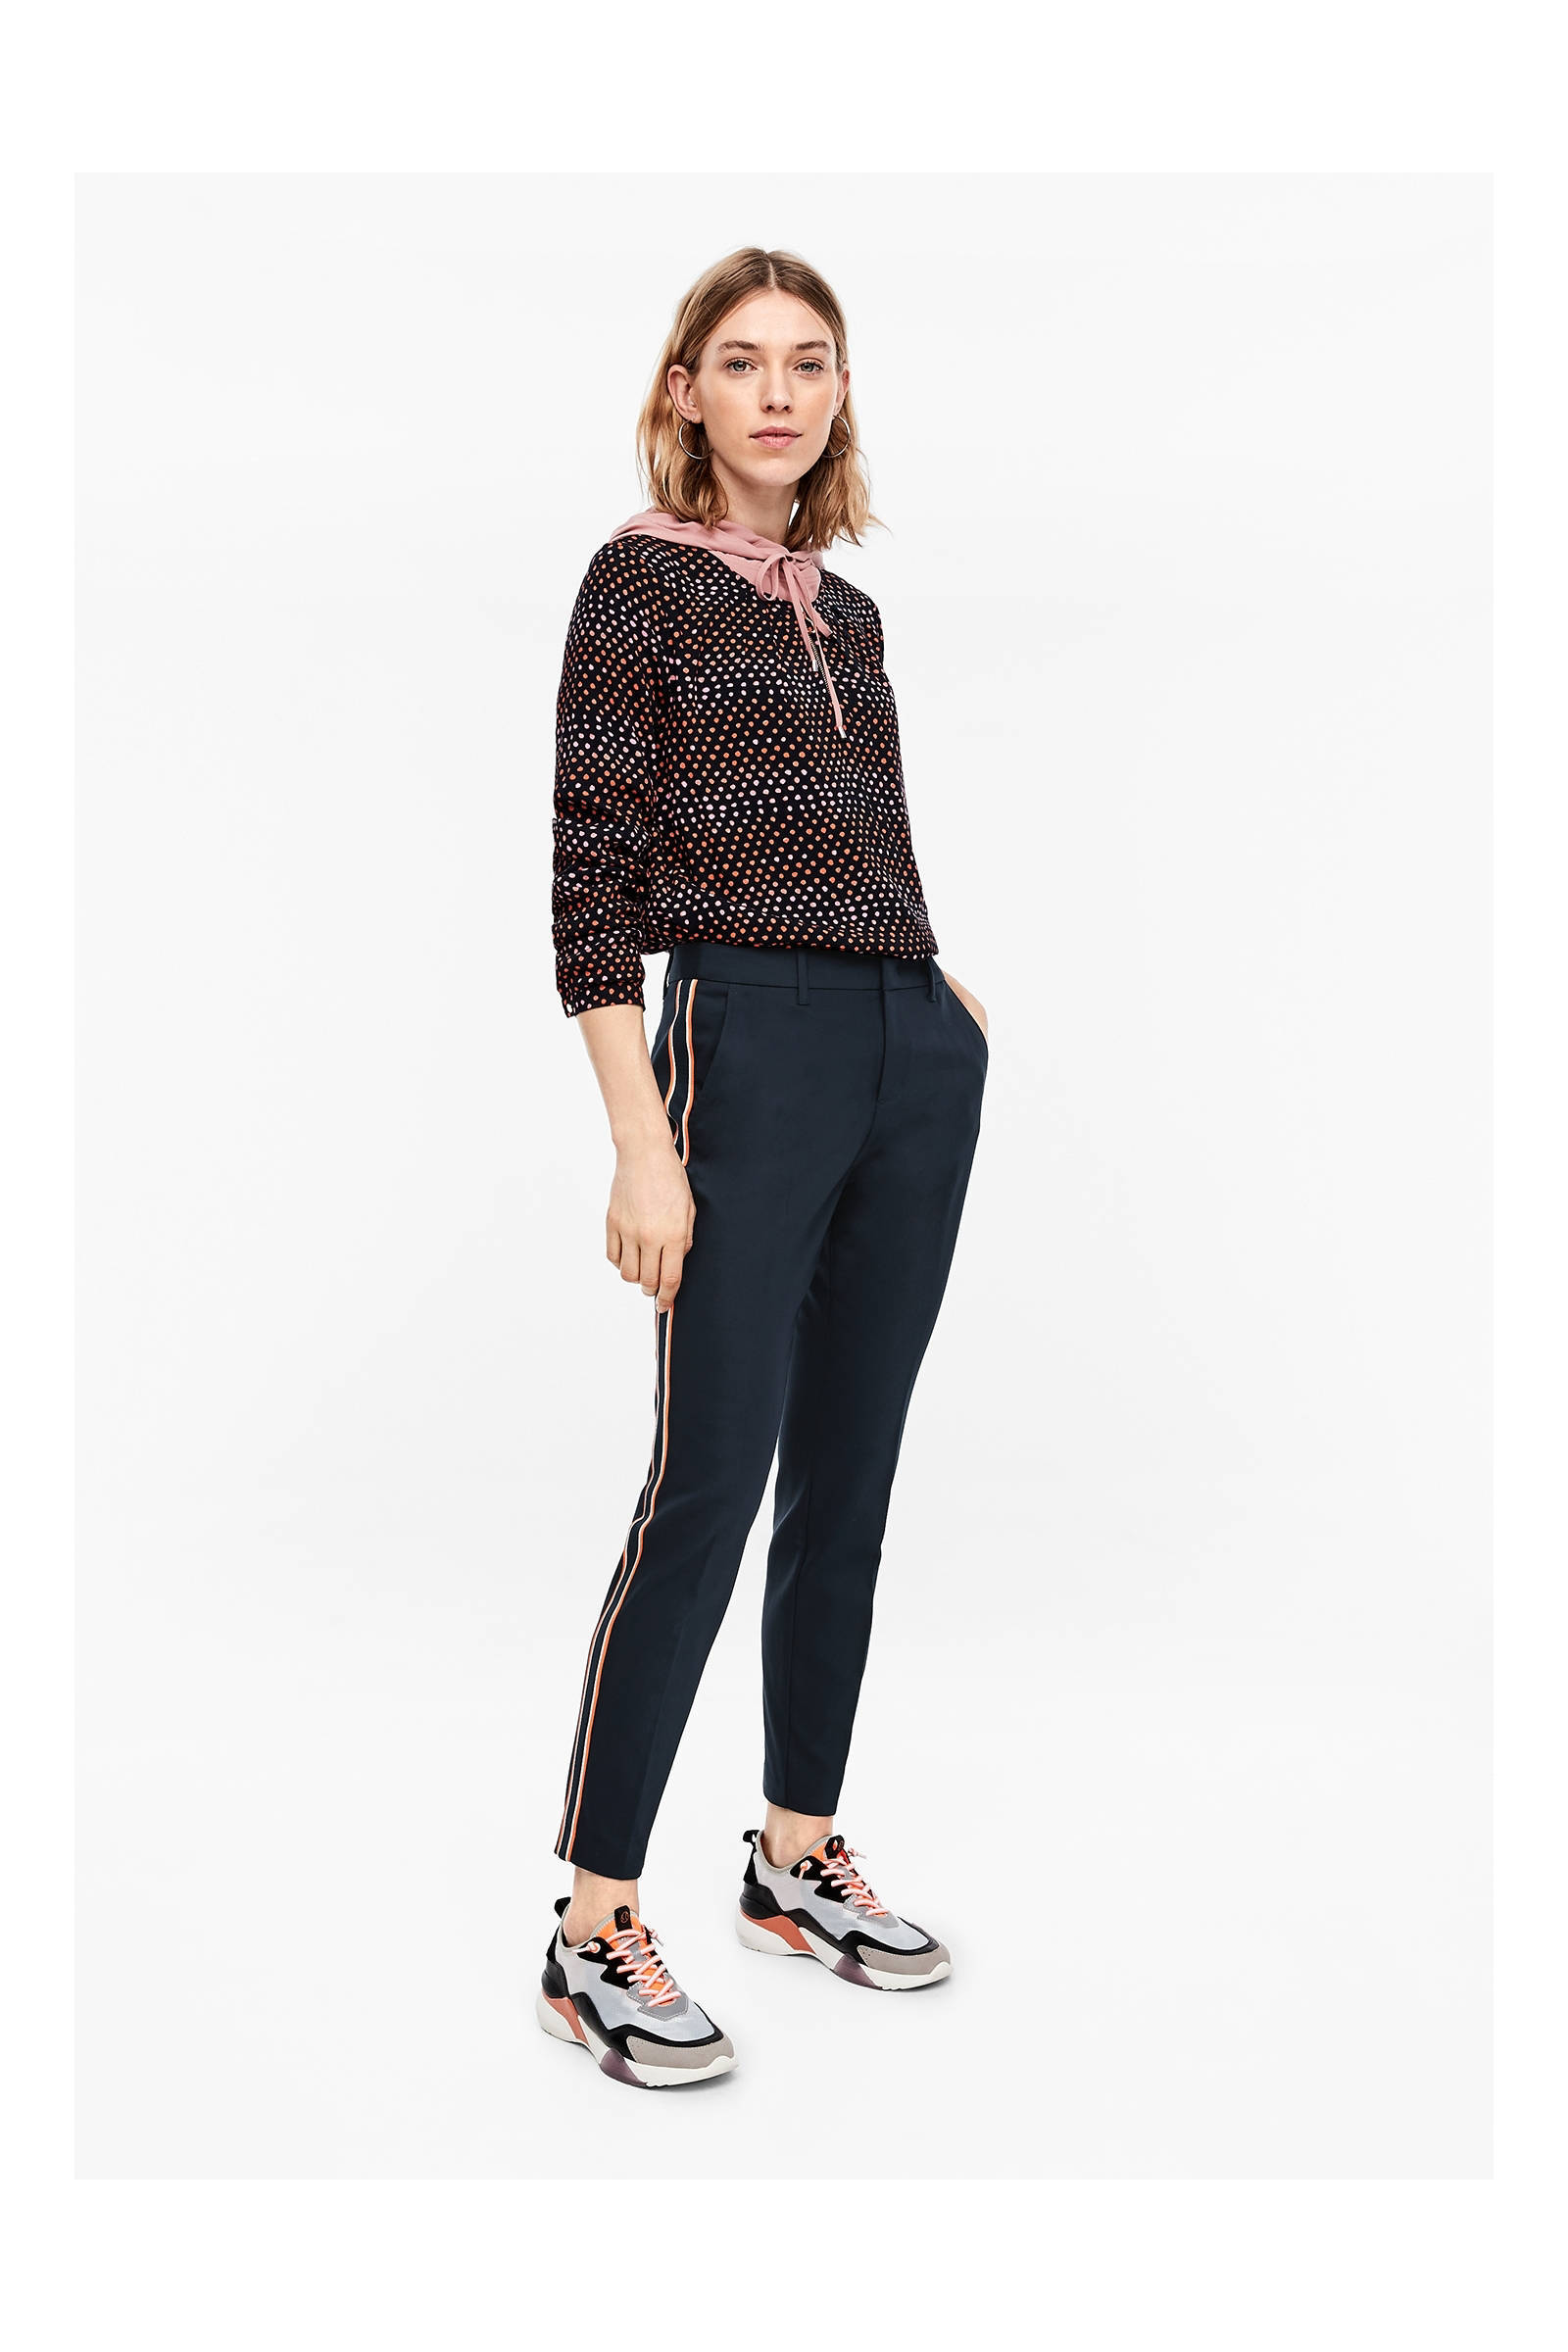 S.oliver Slim Fit Pantalon Met Zijstreep Marine/multi gelgbqis